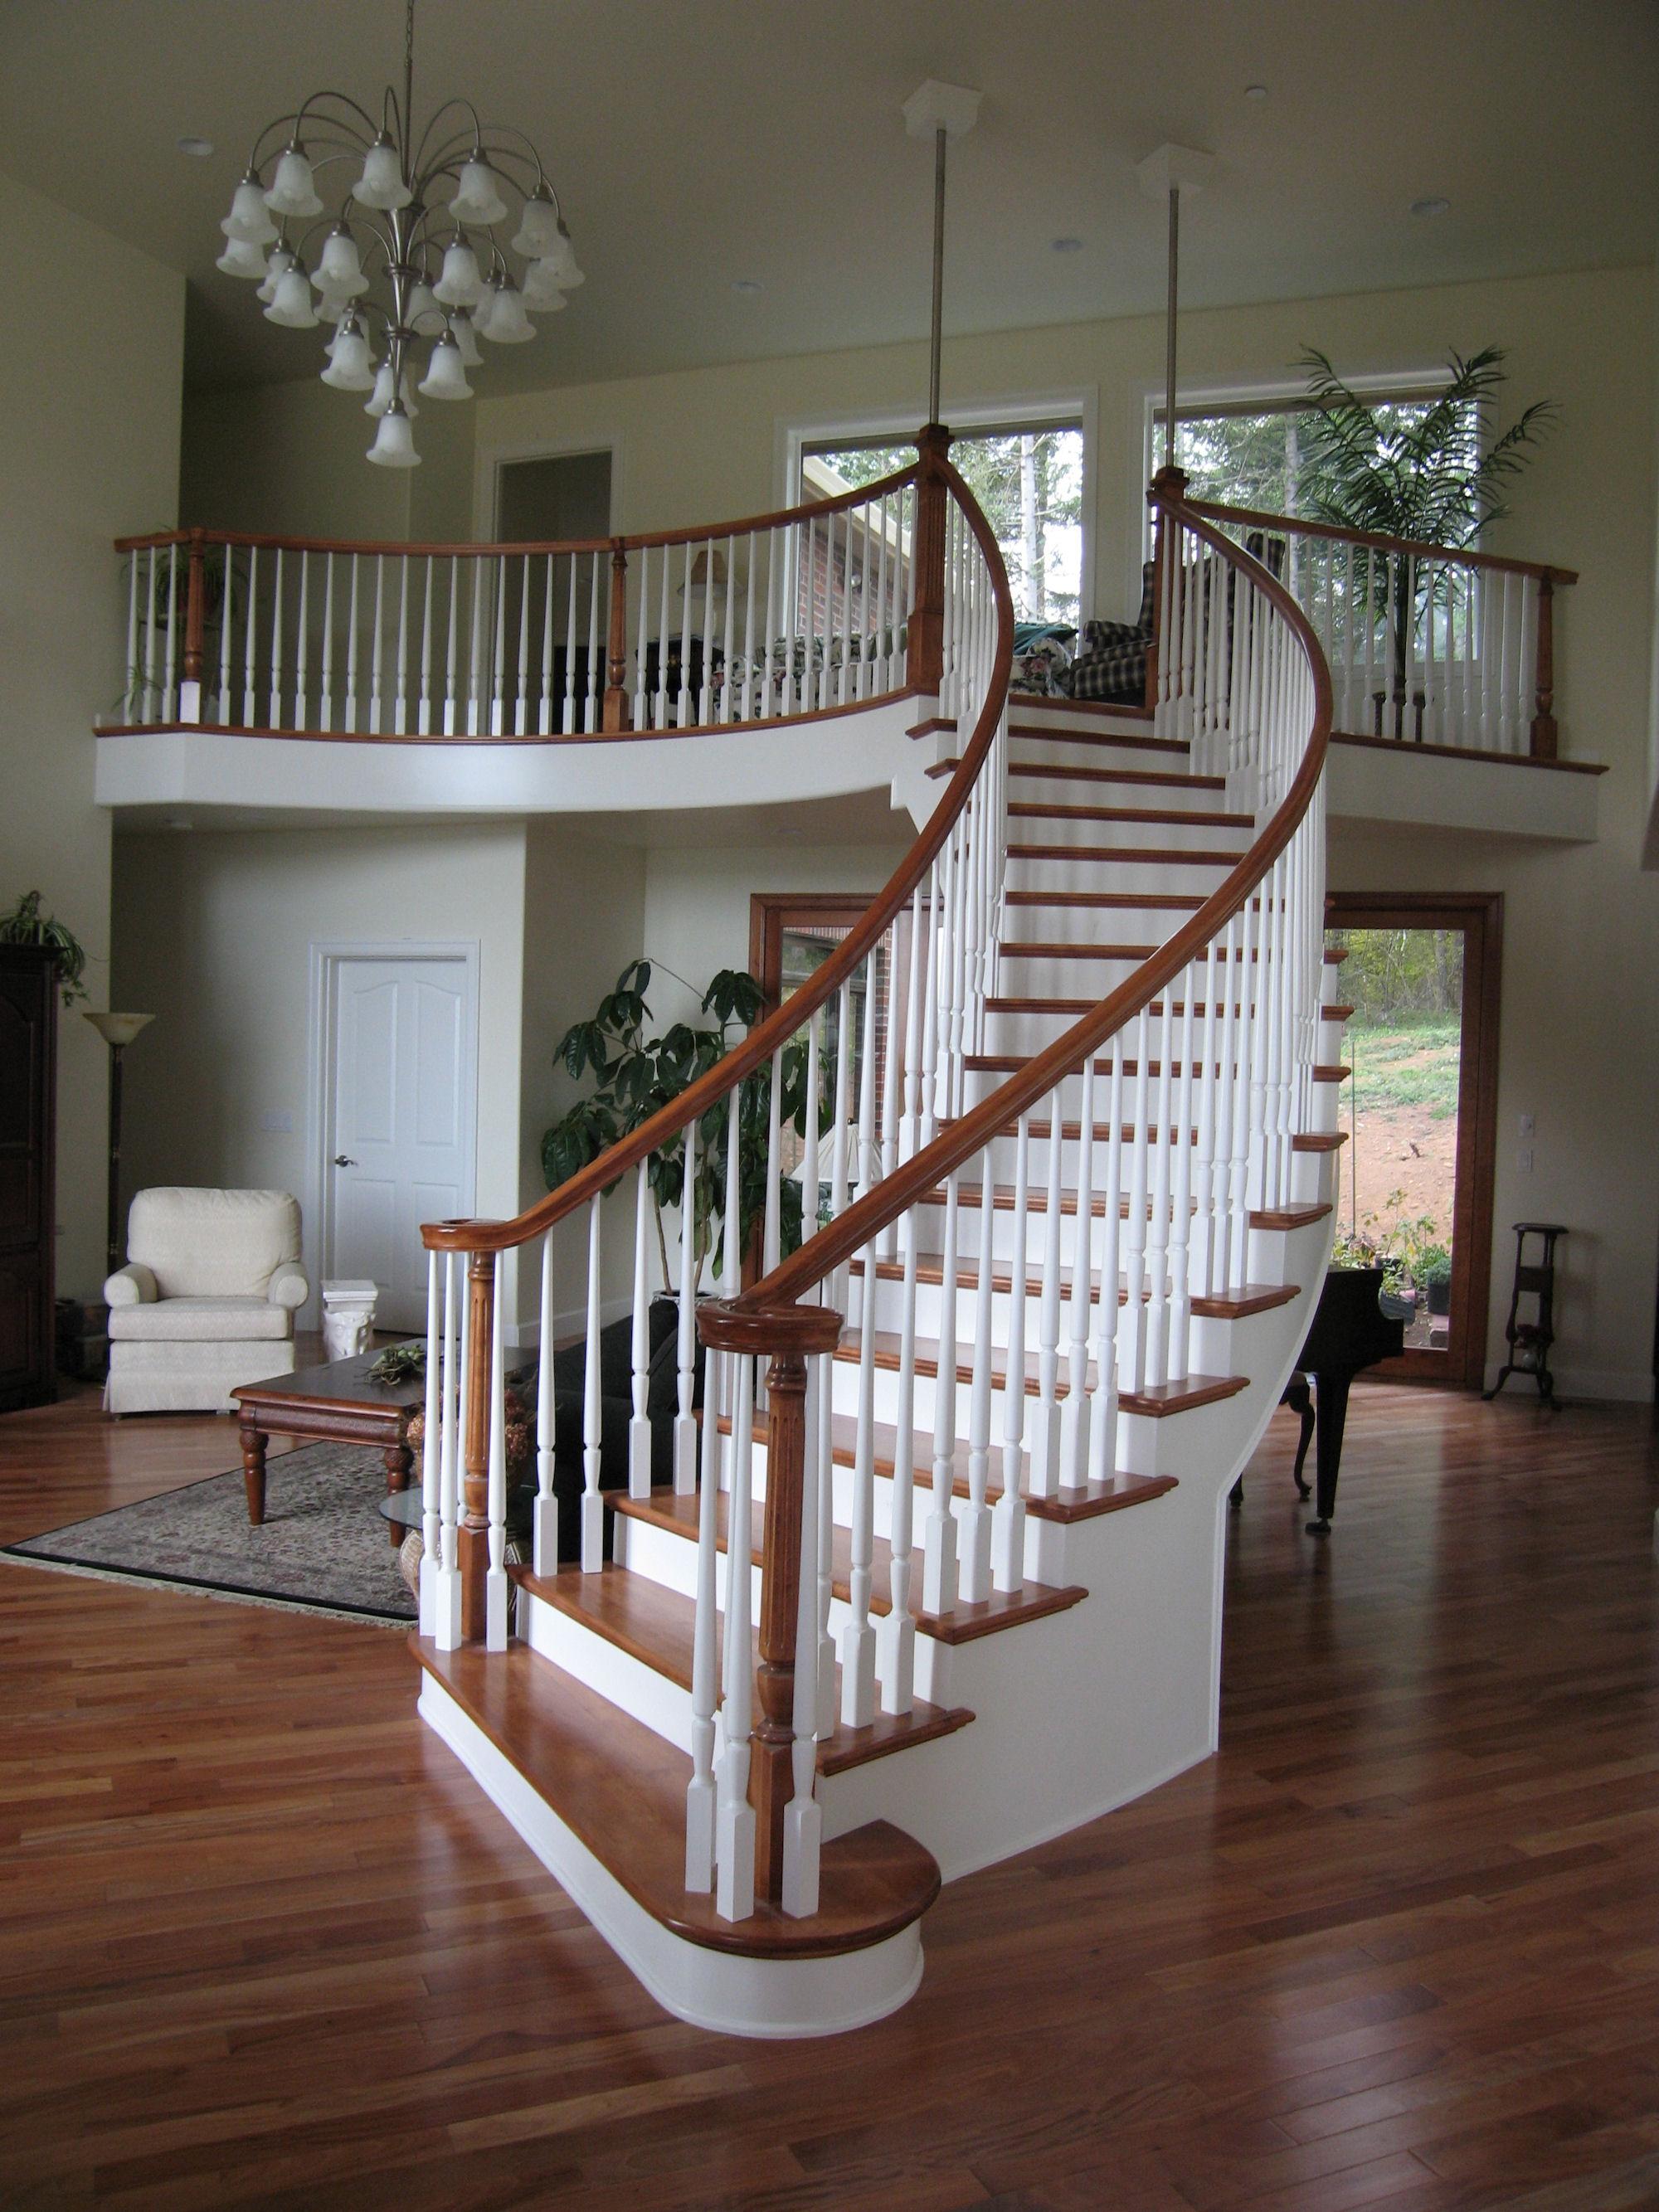 Free Standing Staircase In Camas, Washington.